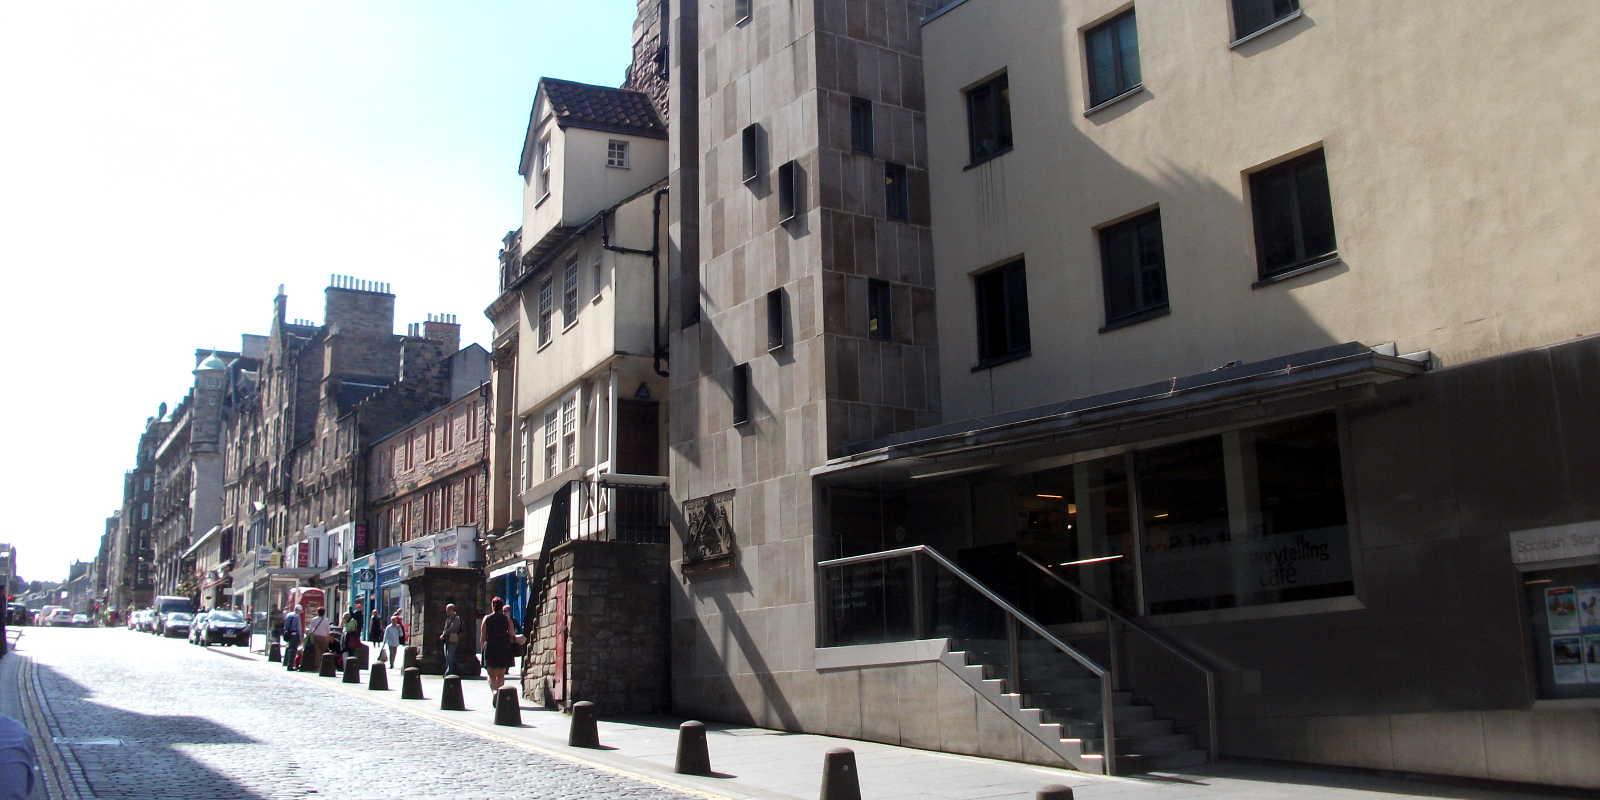 Scottish Storytelling Centre on the Royal Mile in Edinburgh